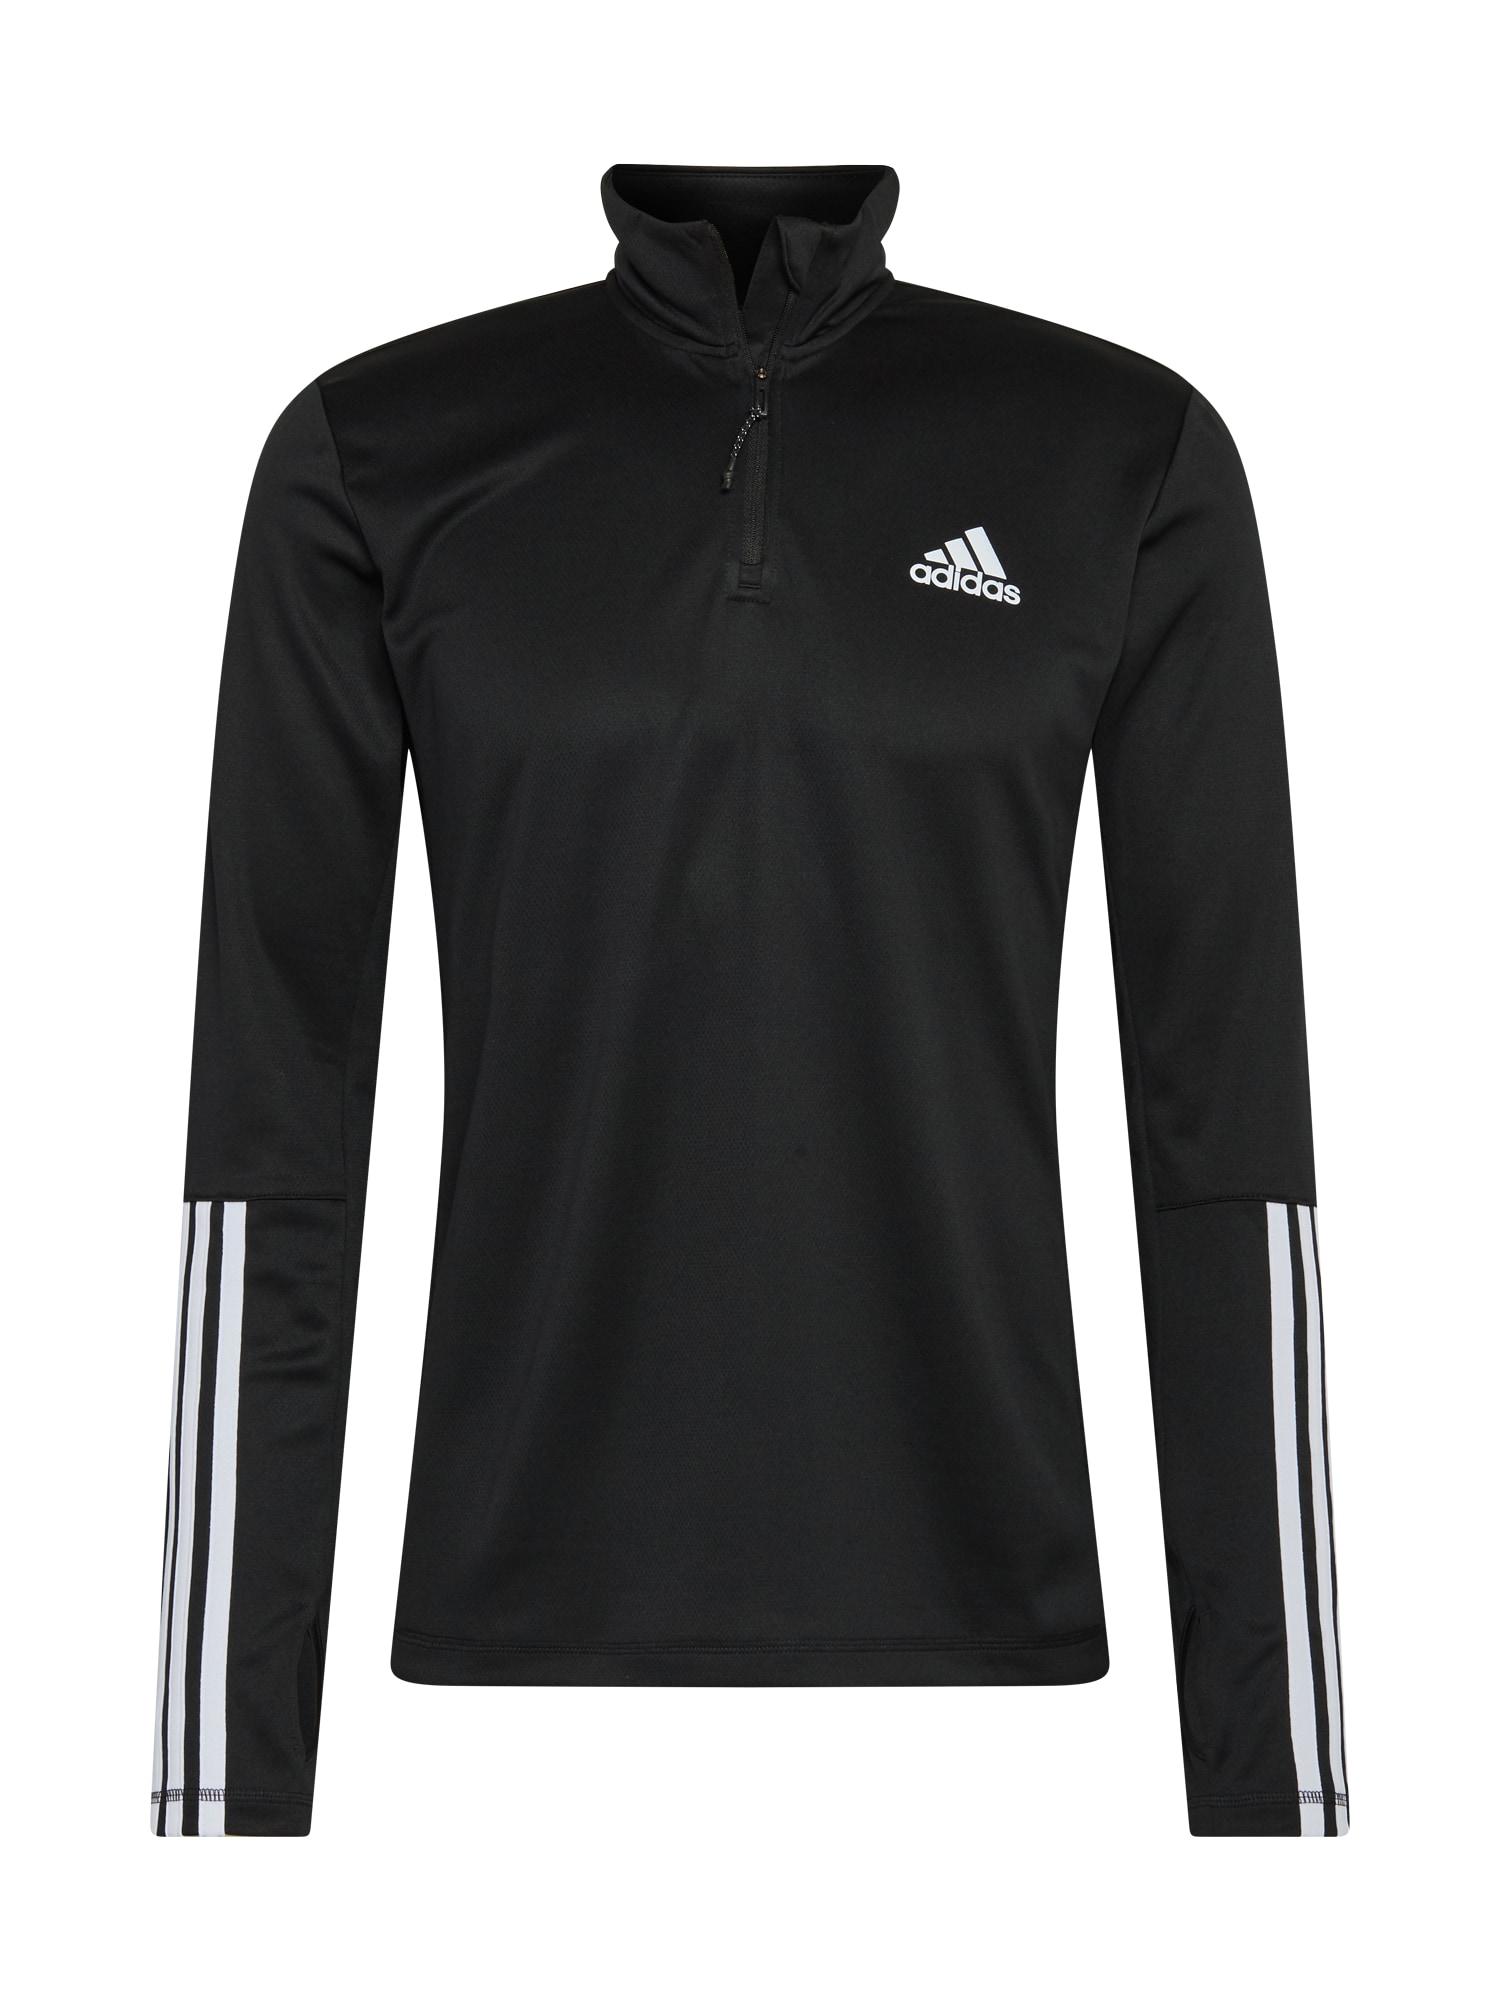 ADIDAS PERFORMANCE Sportinio tipo megztinis 'M IW SWT' balta / juoda